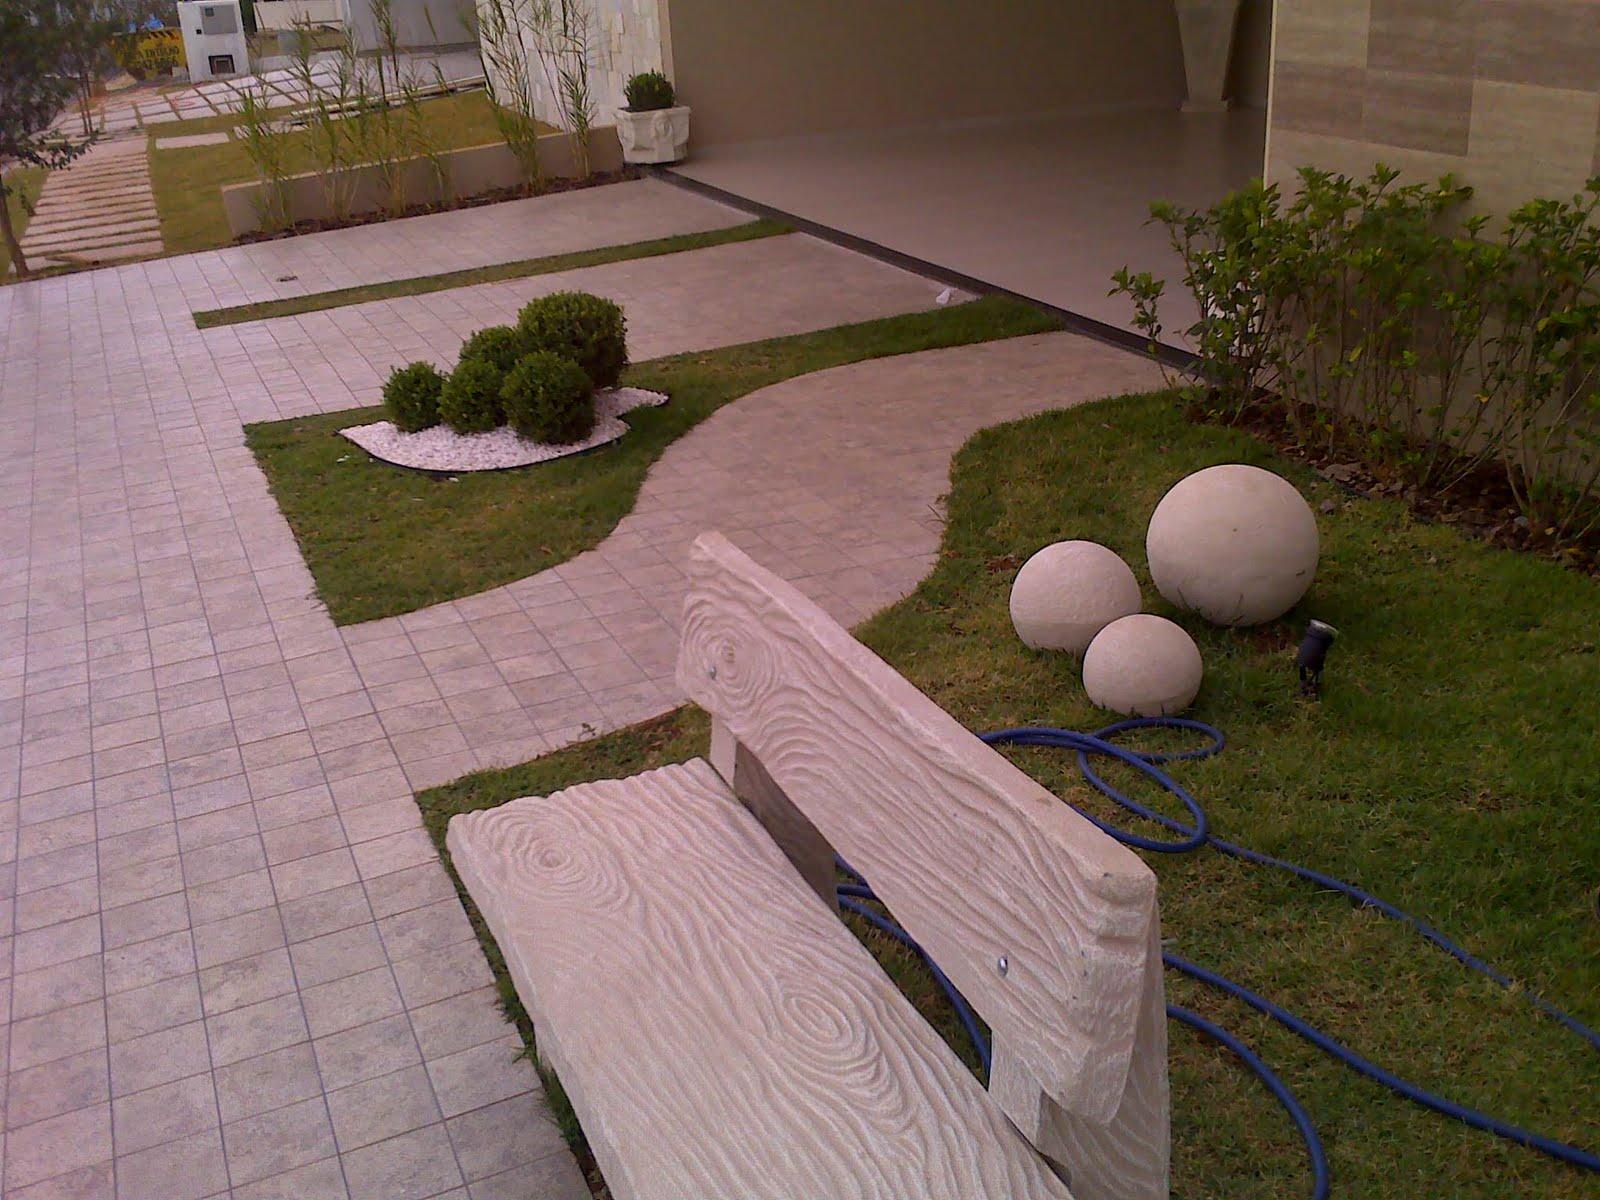 pedras jardim baratas : pedras jardim baratas:Modelos de pisos para calçadas externas